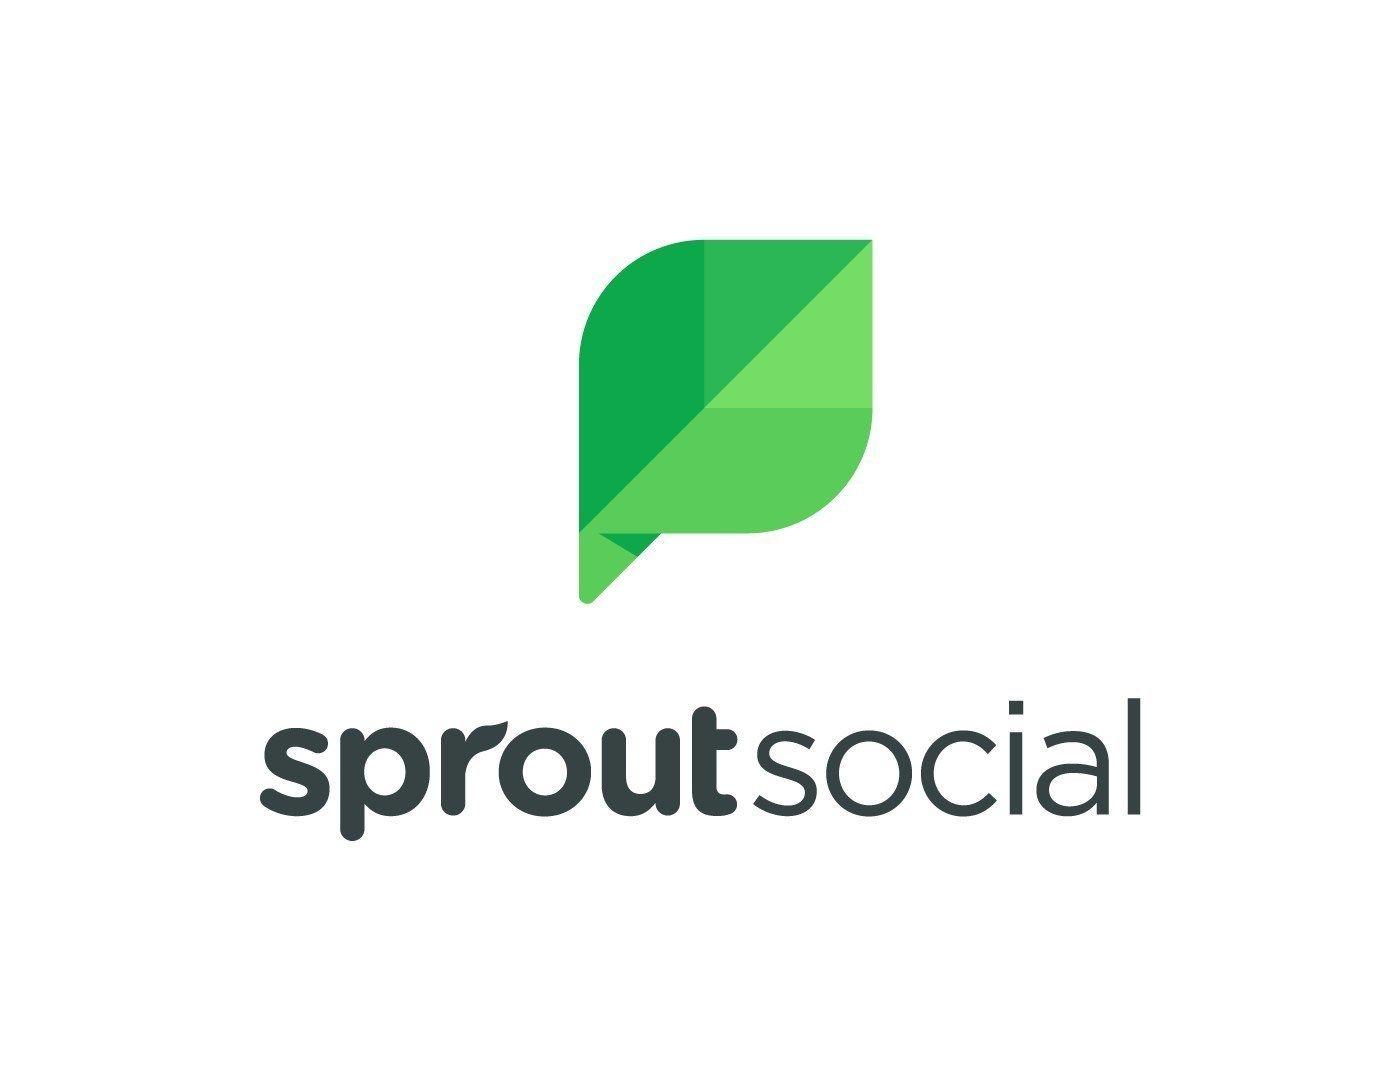 Overview Of Smb Cloud Social Media Management Service Sprout Social Short Review Social Media Analytics Tools Social Media Management Services Sprout Social